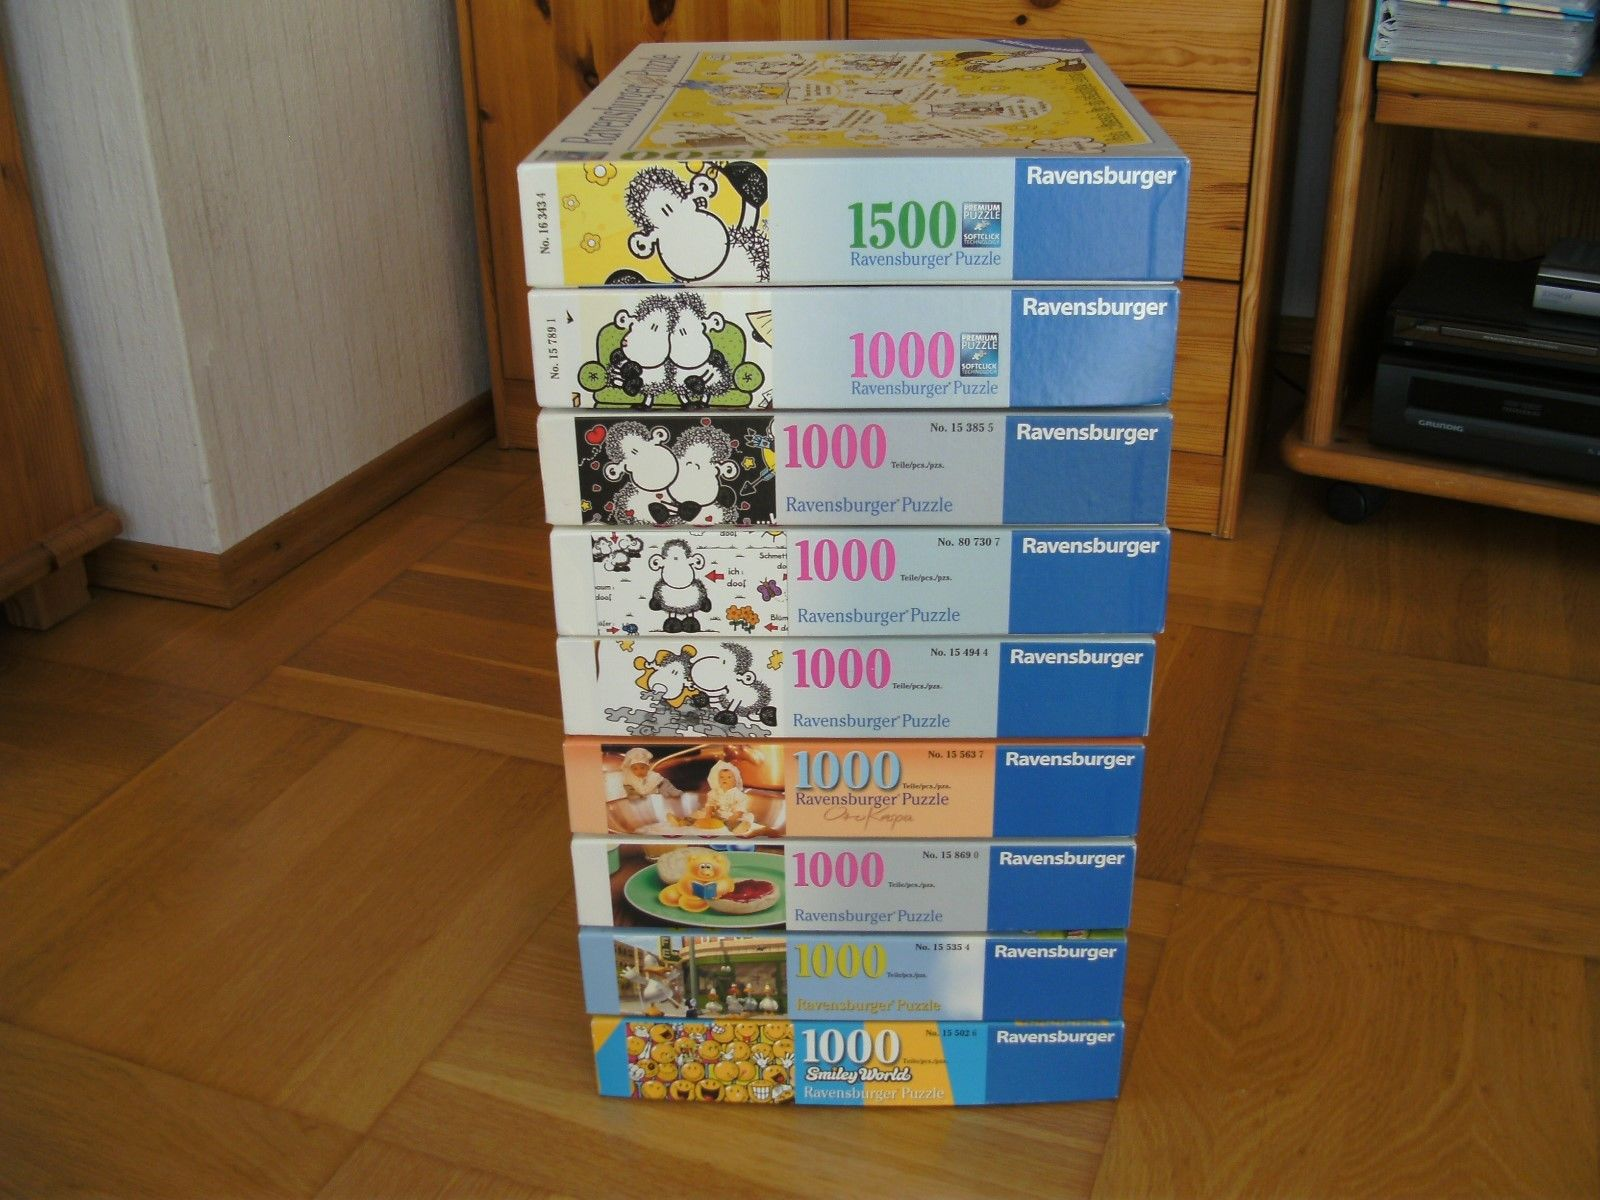 Puzzle Sammlung, 9x Ravensburger Konvolut,sheepworld,Gelini,Smiley guter Zustand